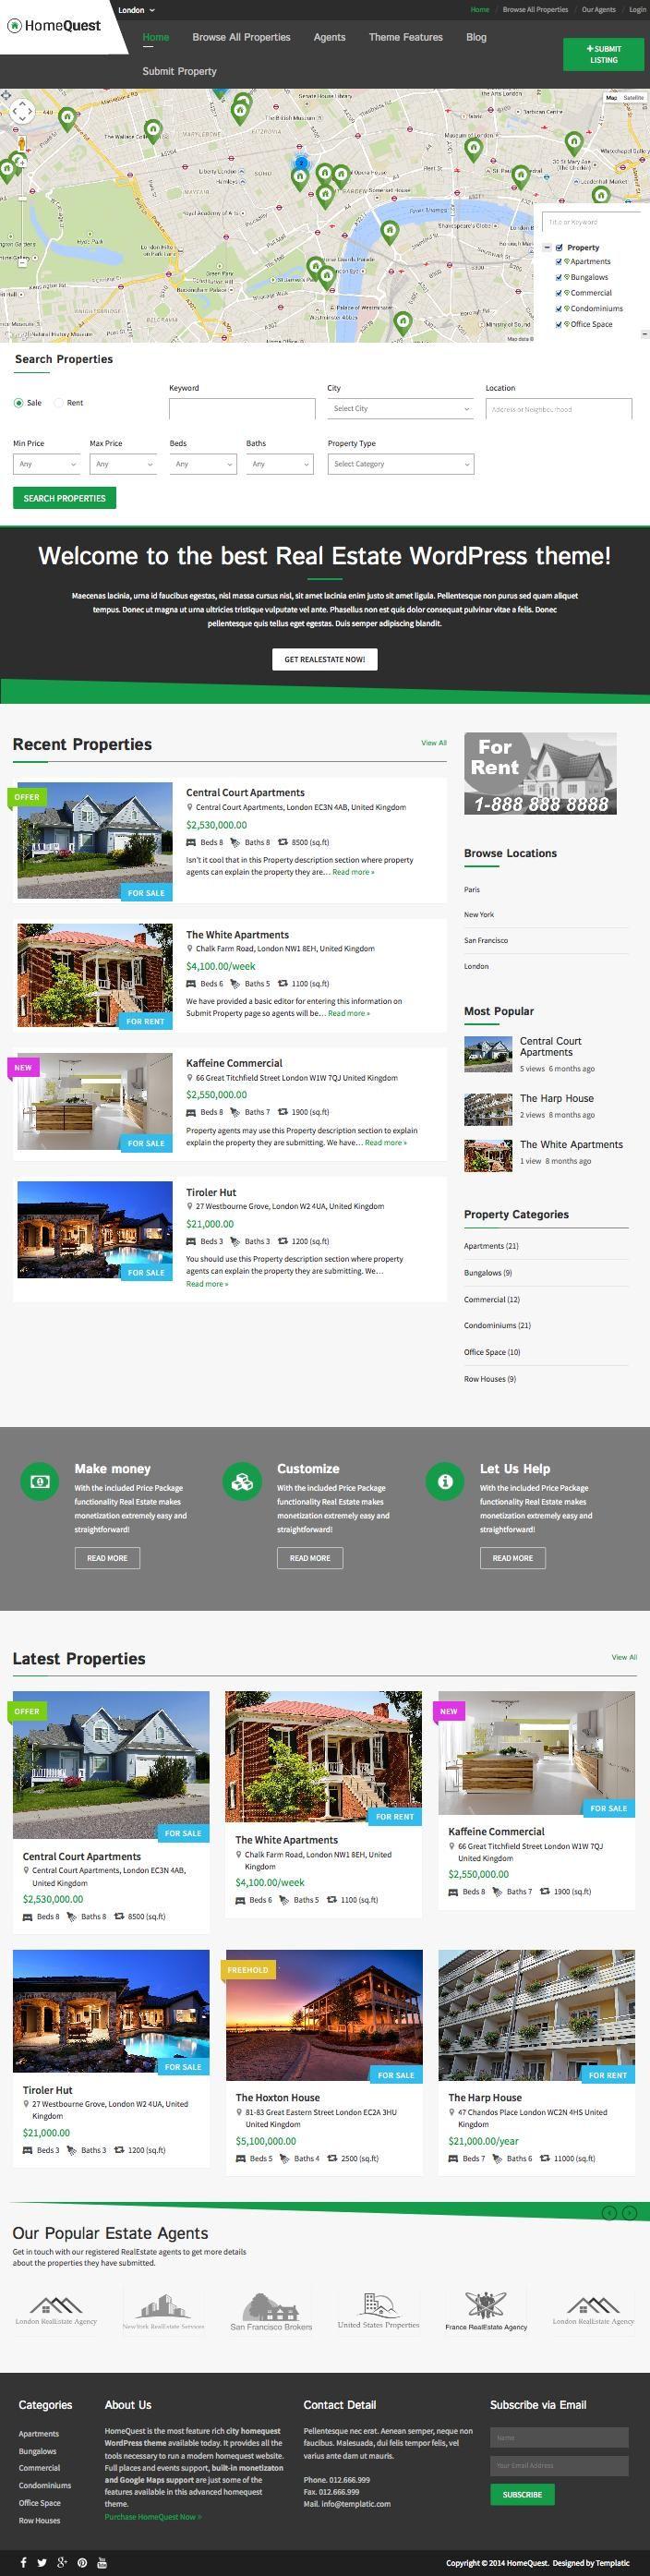 317 best WordPress images on Pinterest